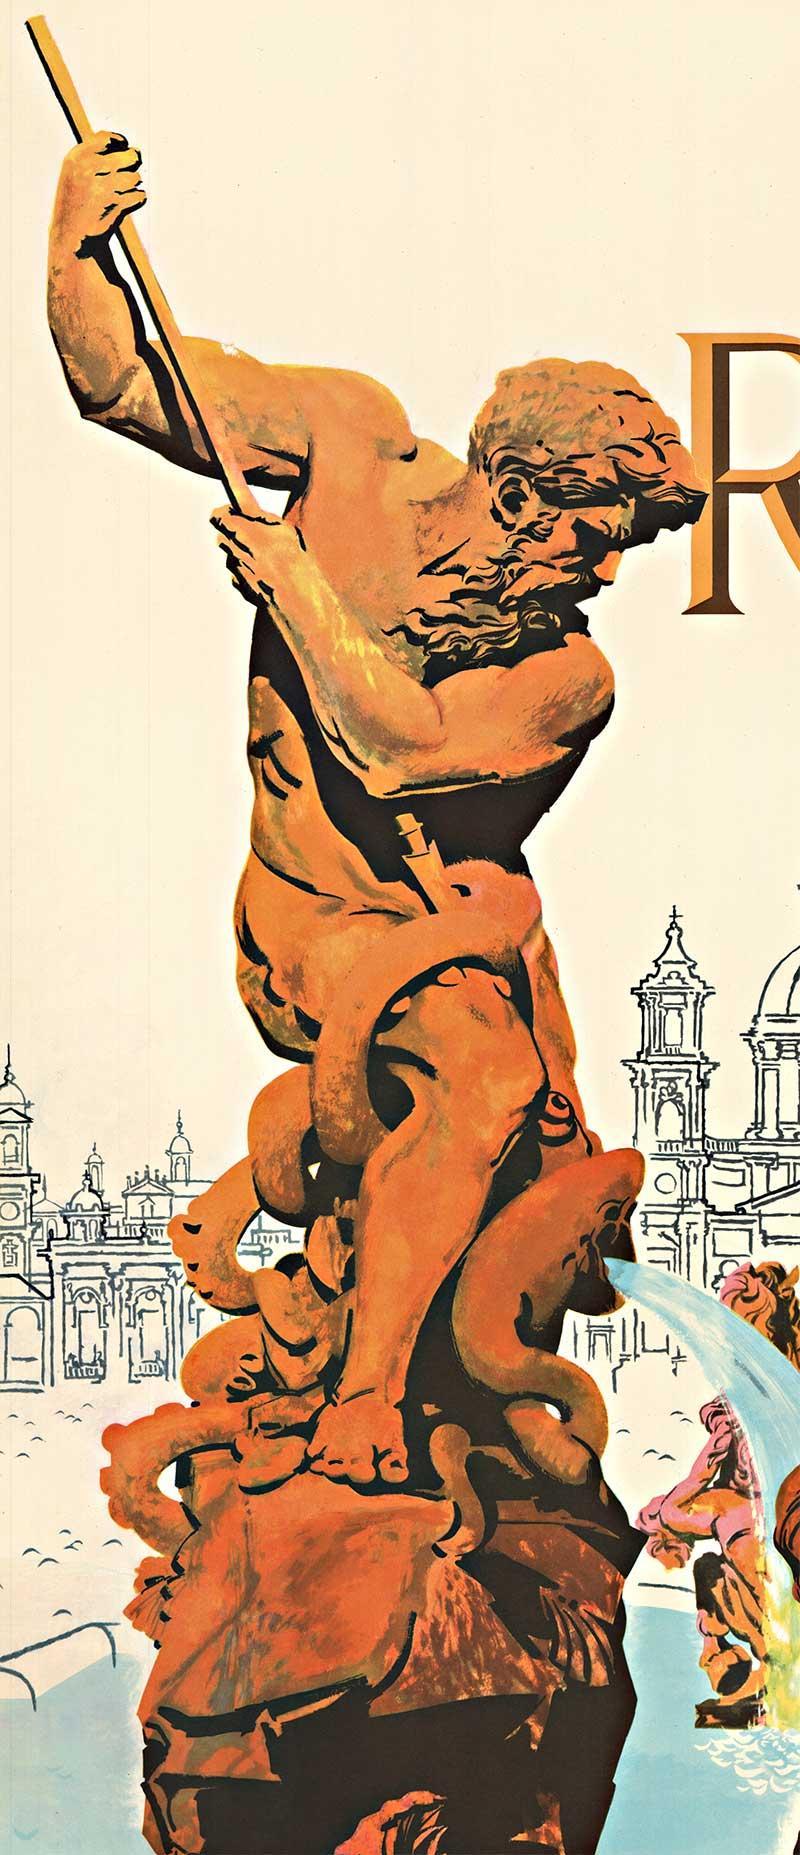 Original earliest Rome via TWA vintage travel poster